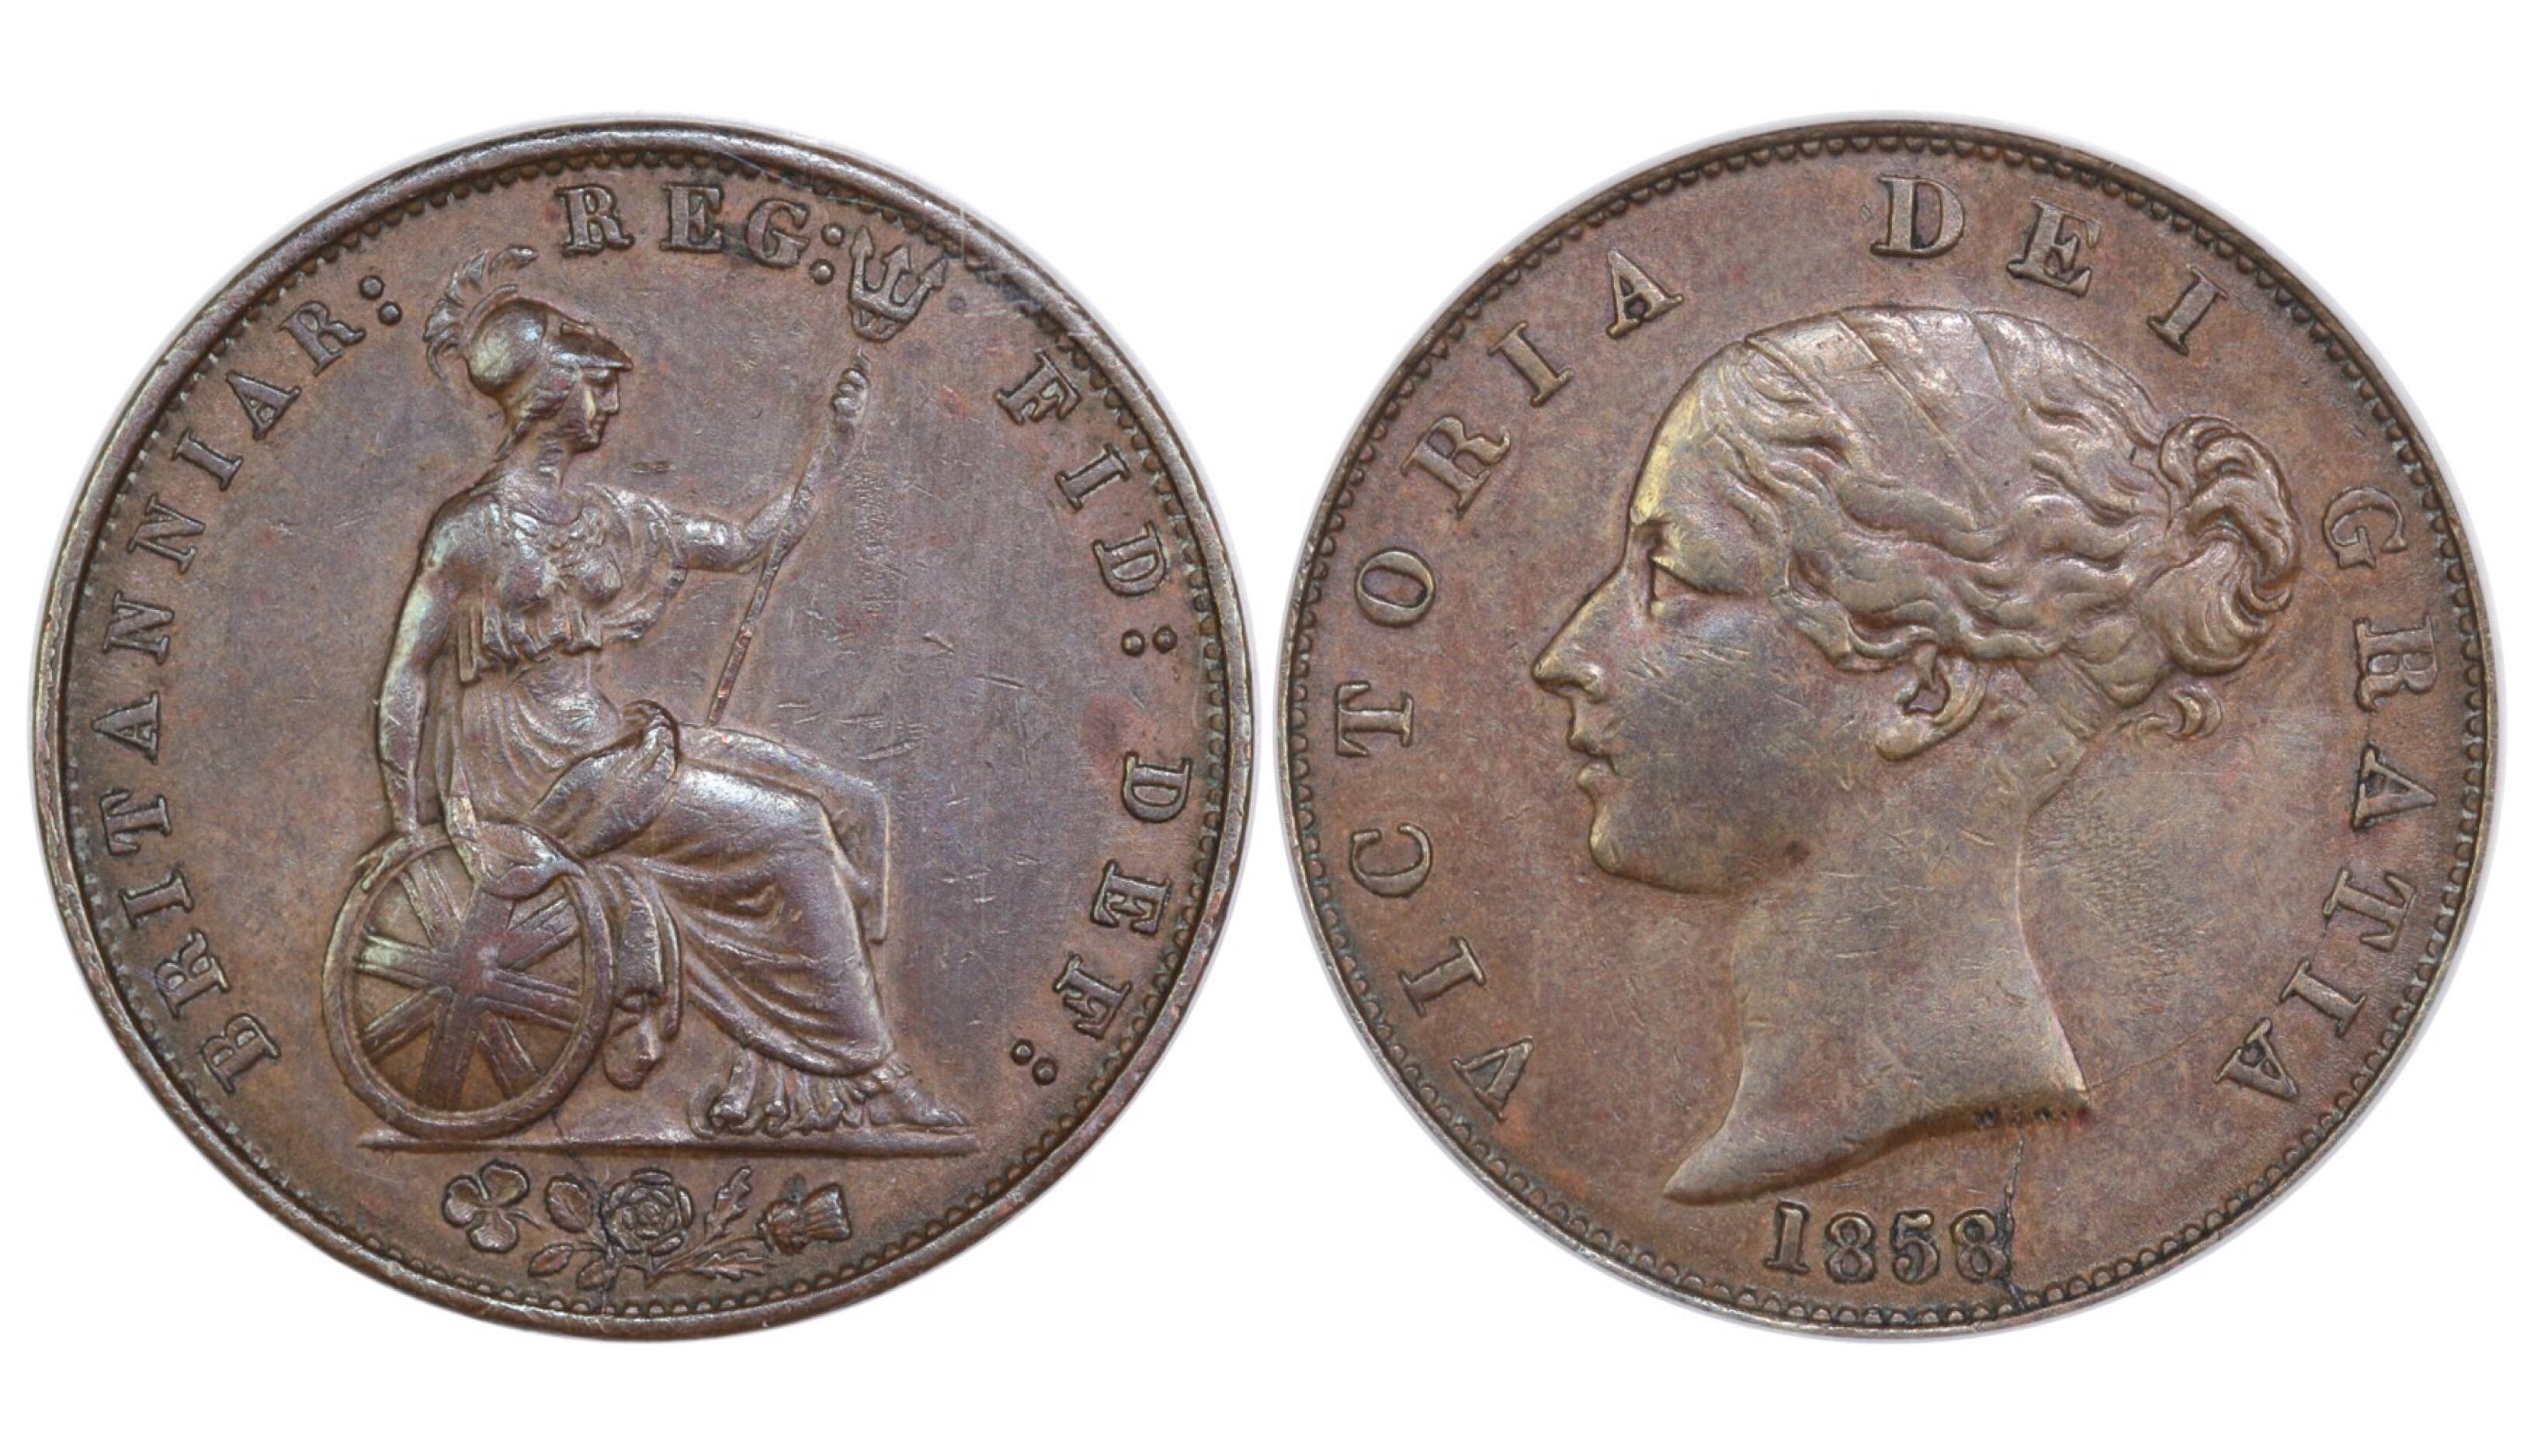 1858/6 Halfpenny, CGS 45, Victoria, Peck 1547, UIN 36458